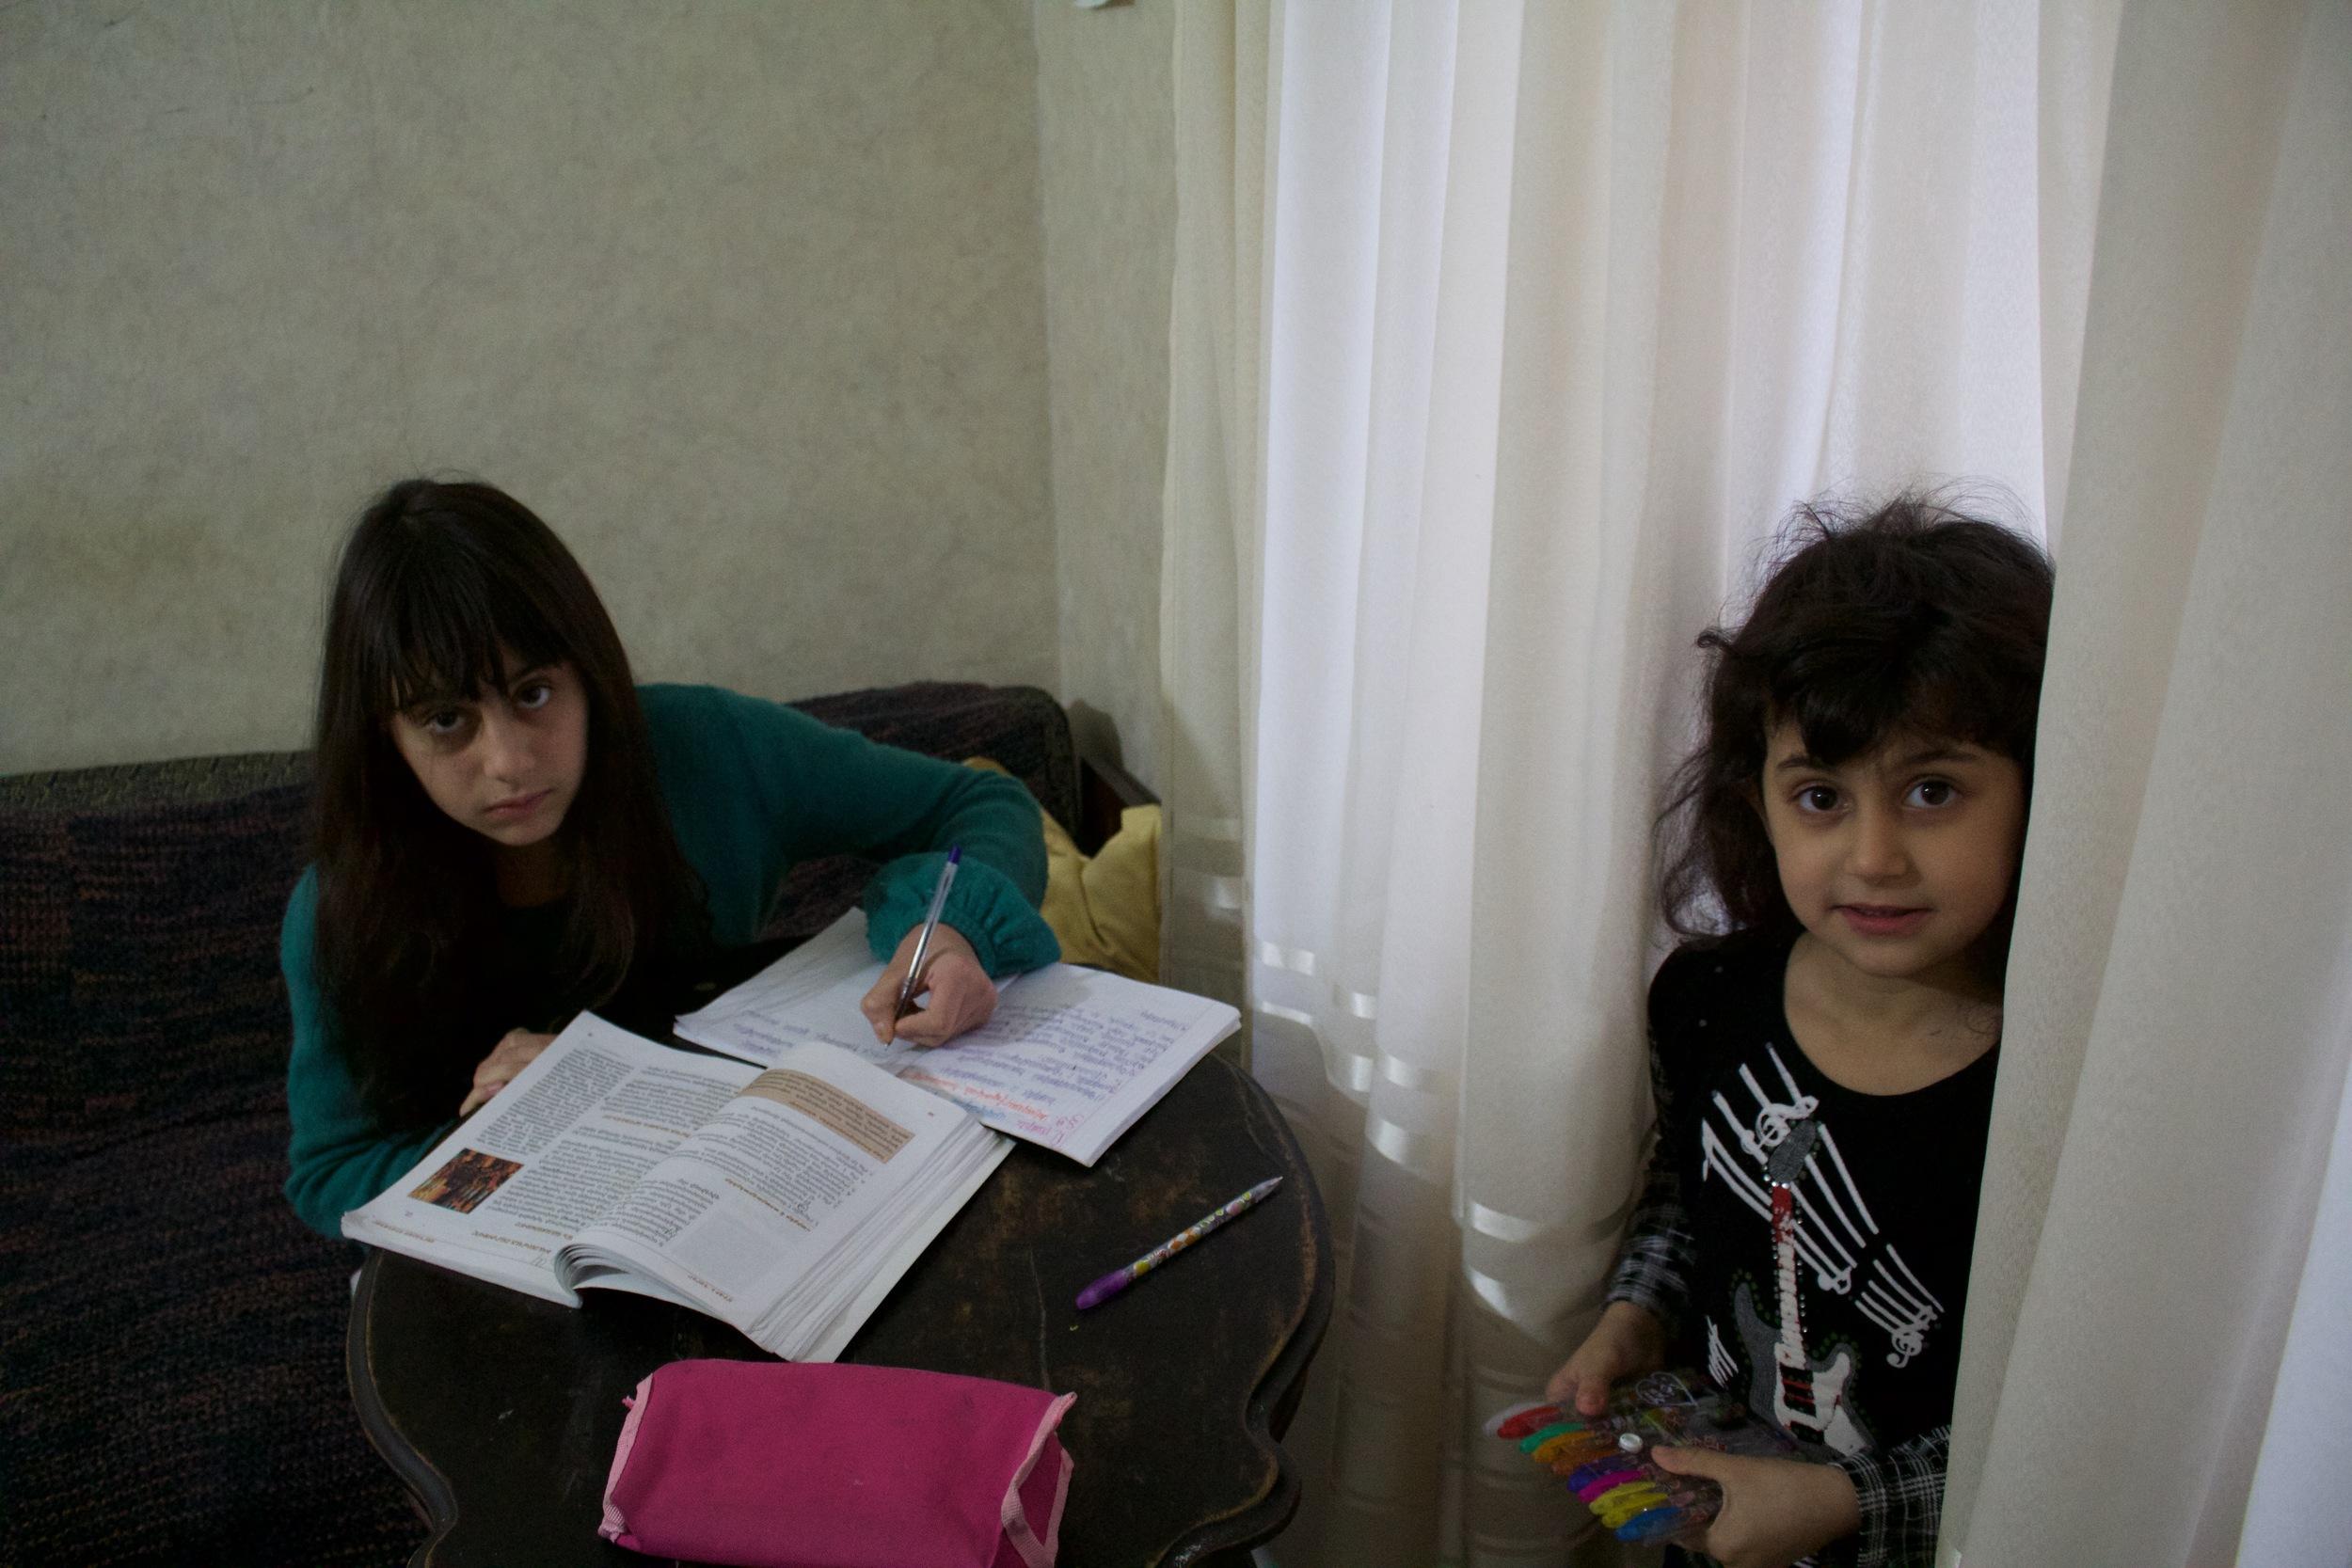 Arpi and Serli doing their homework